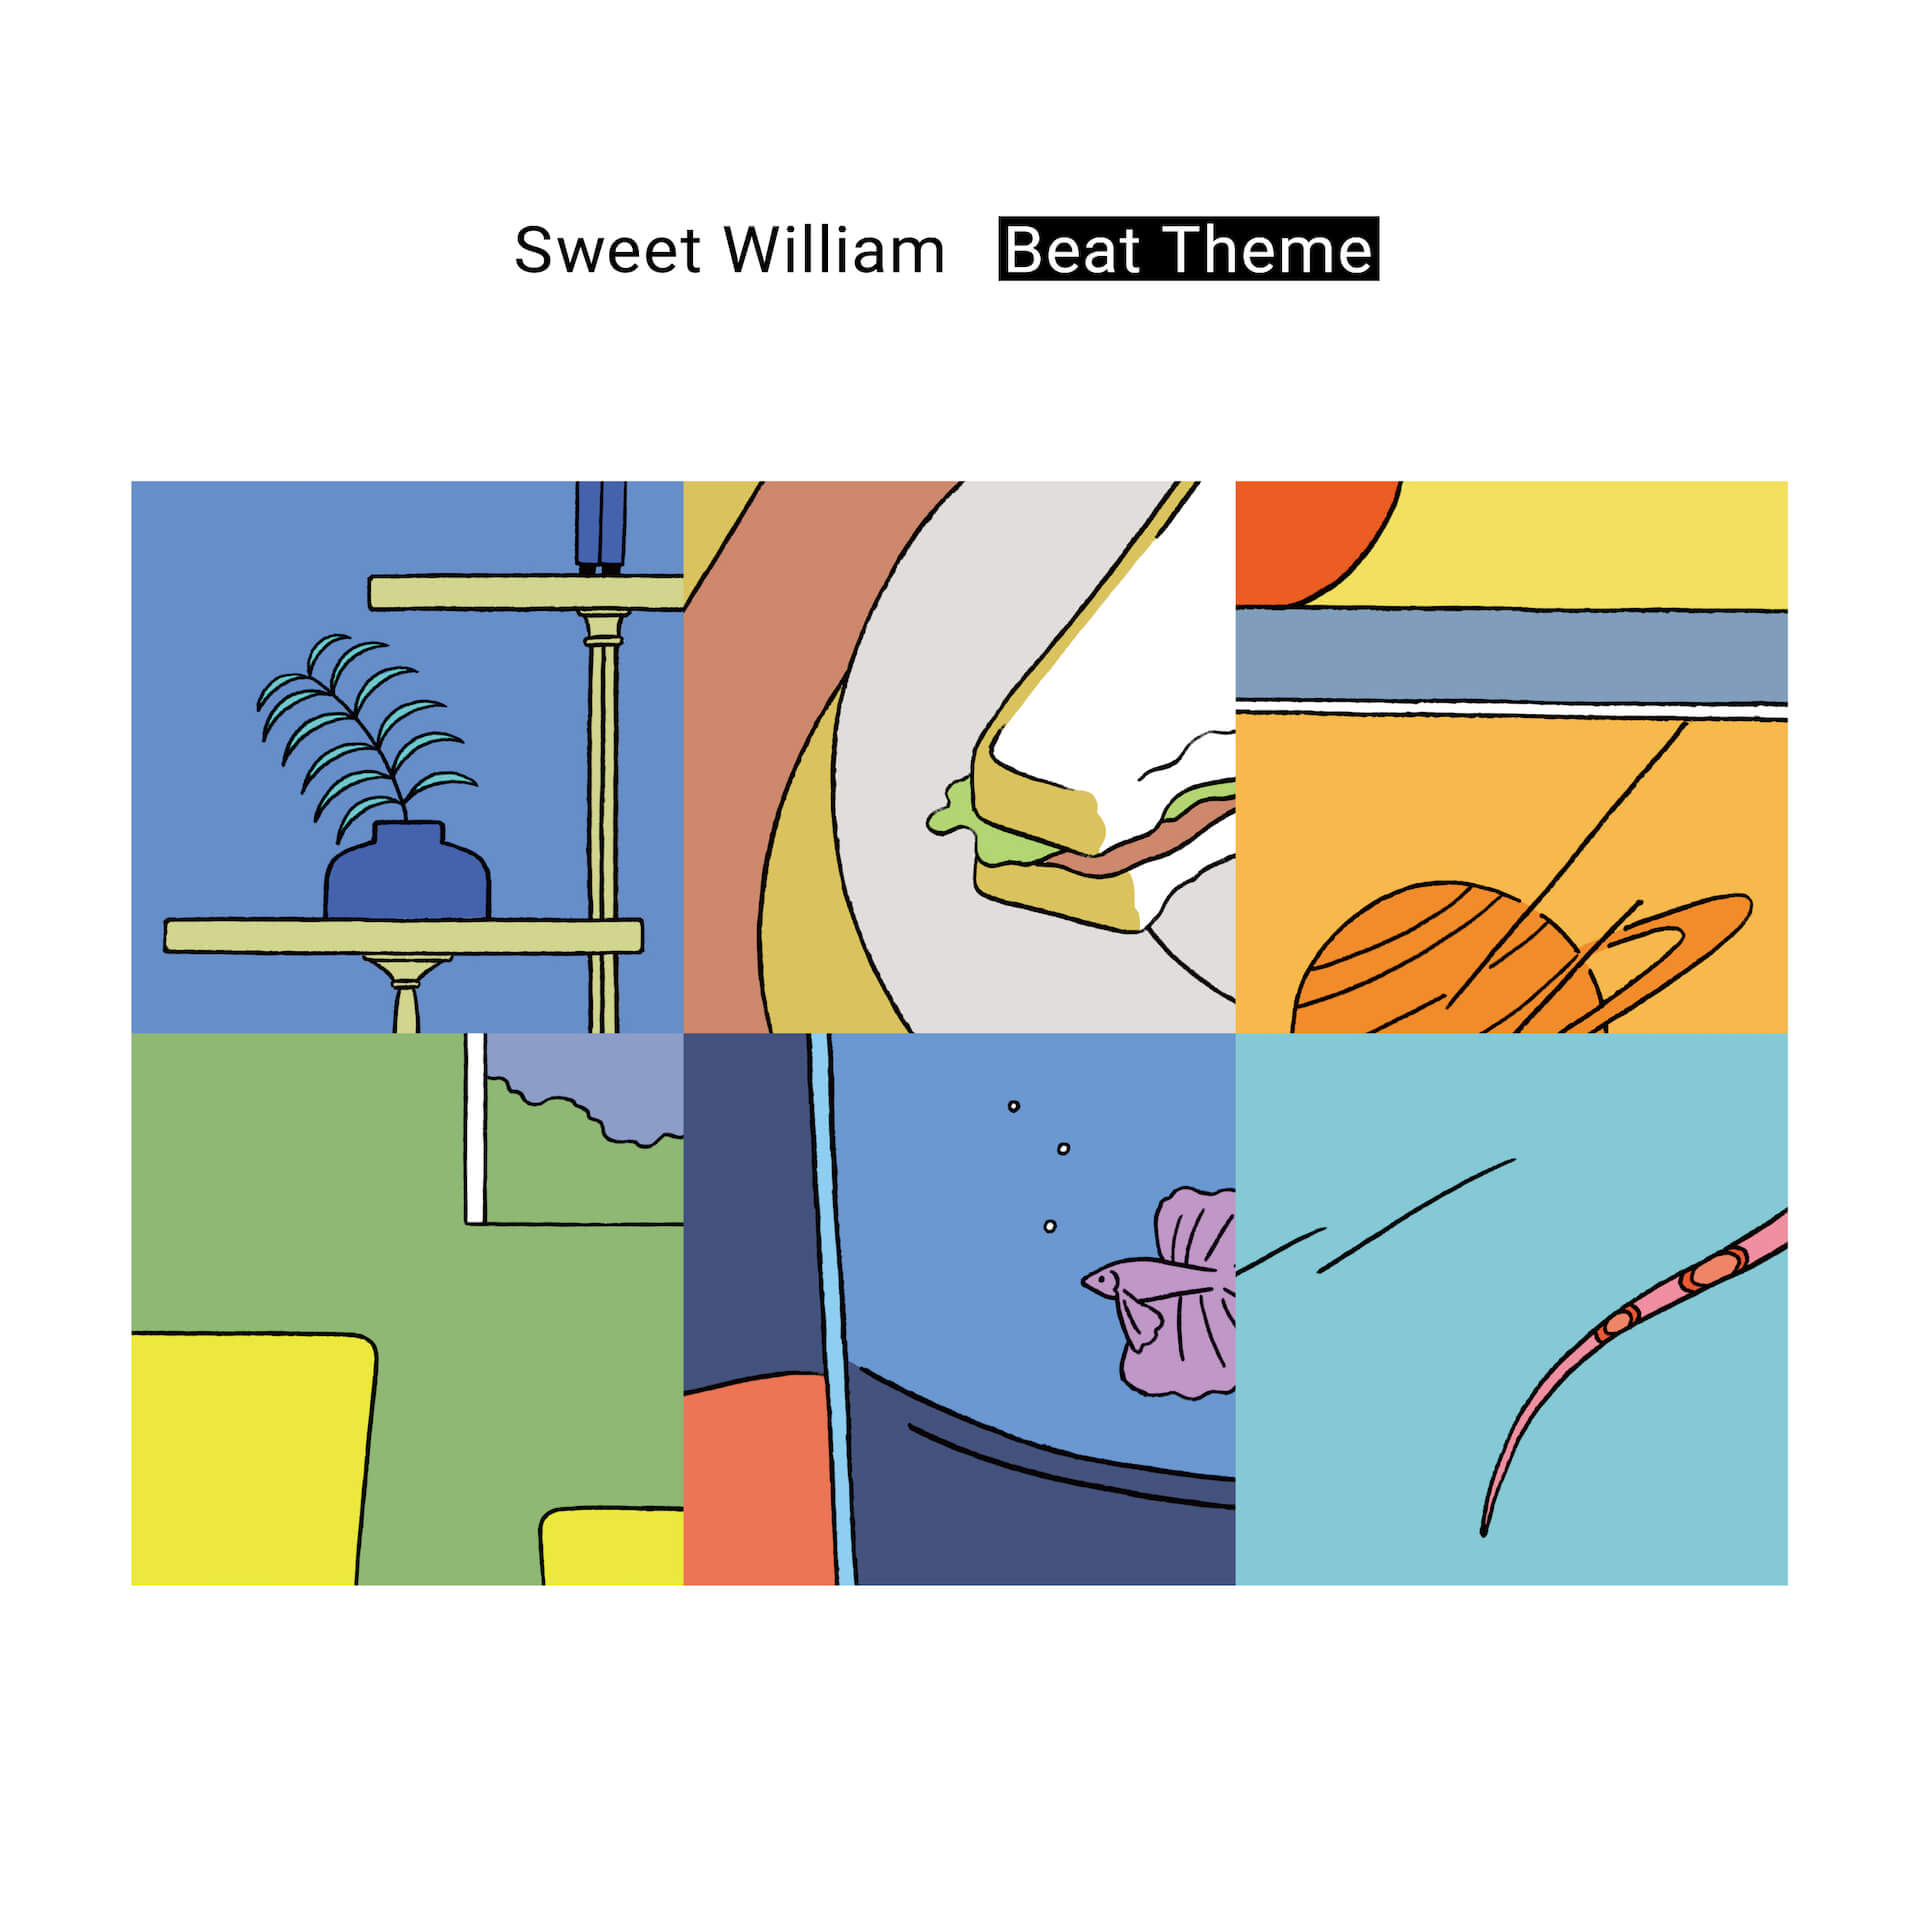 Sweet Williamが5年ぶりとなる待望のニューアルバム『Beat Theme』のリリースを発表!表題曲ティーザー映像も解禁 music210519_sweetwilliam-210519_2